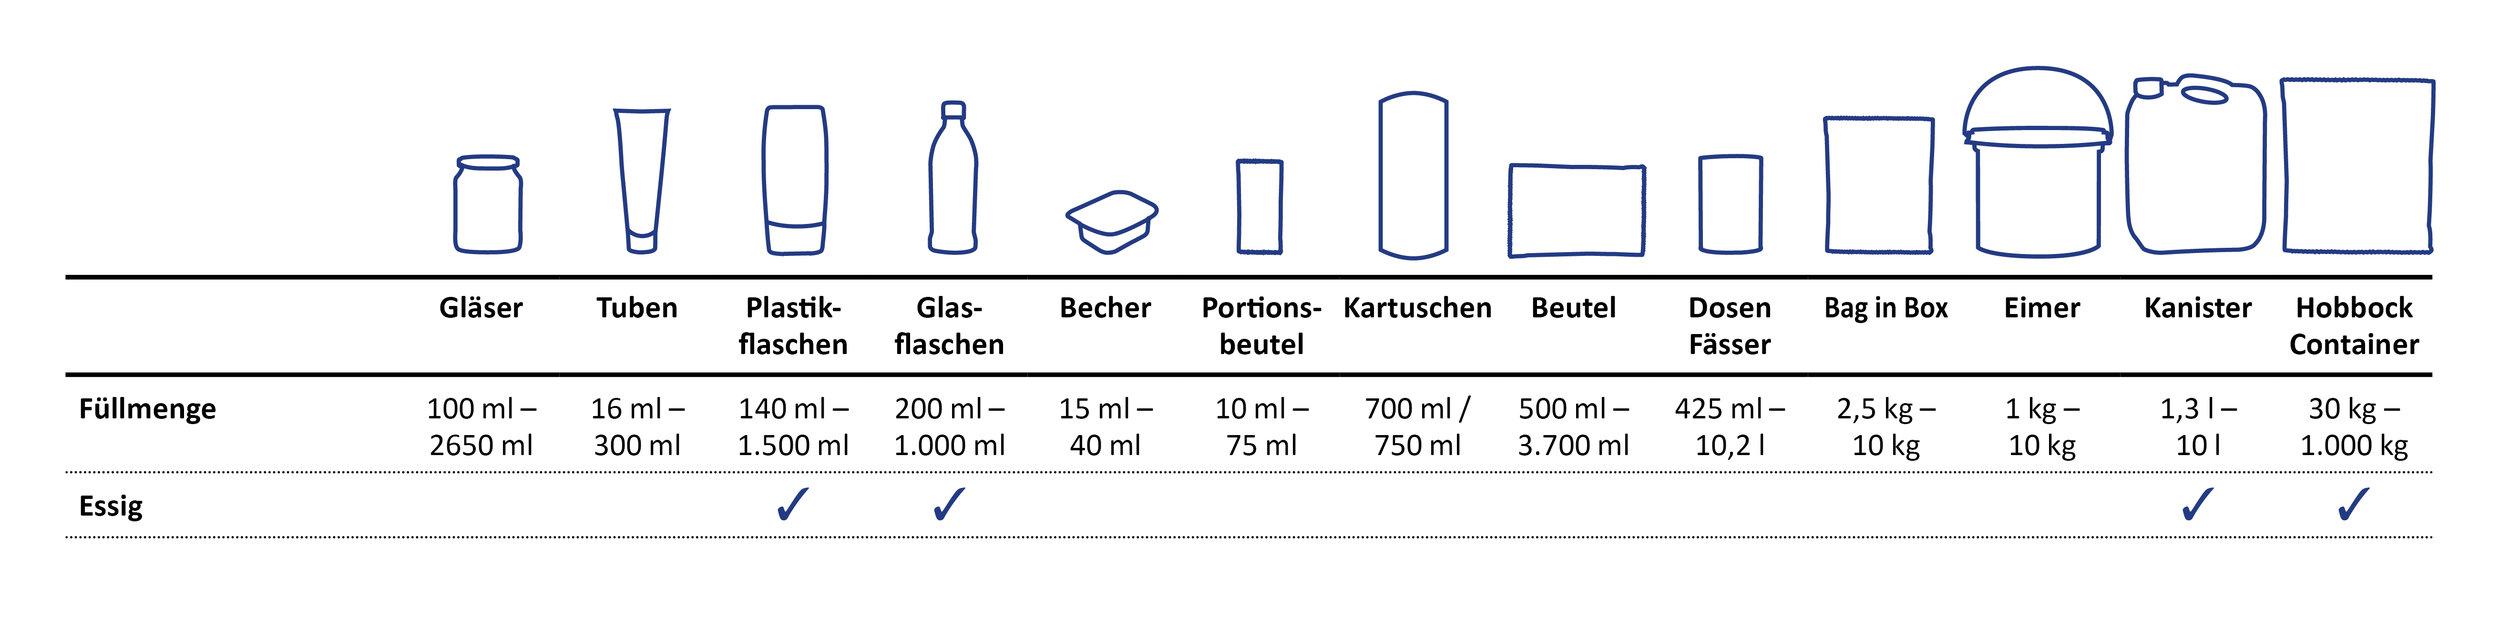 verpackungsuebersicht -sueko-essig.jpg